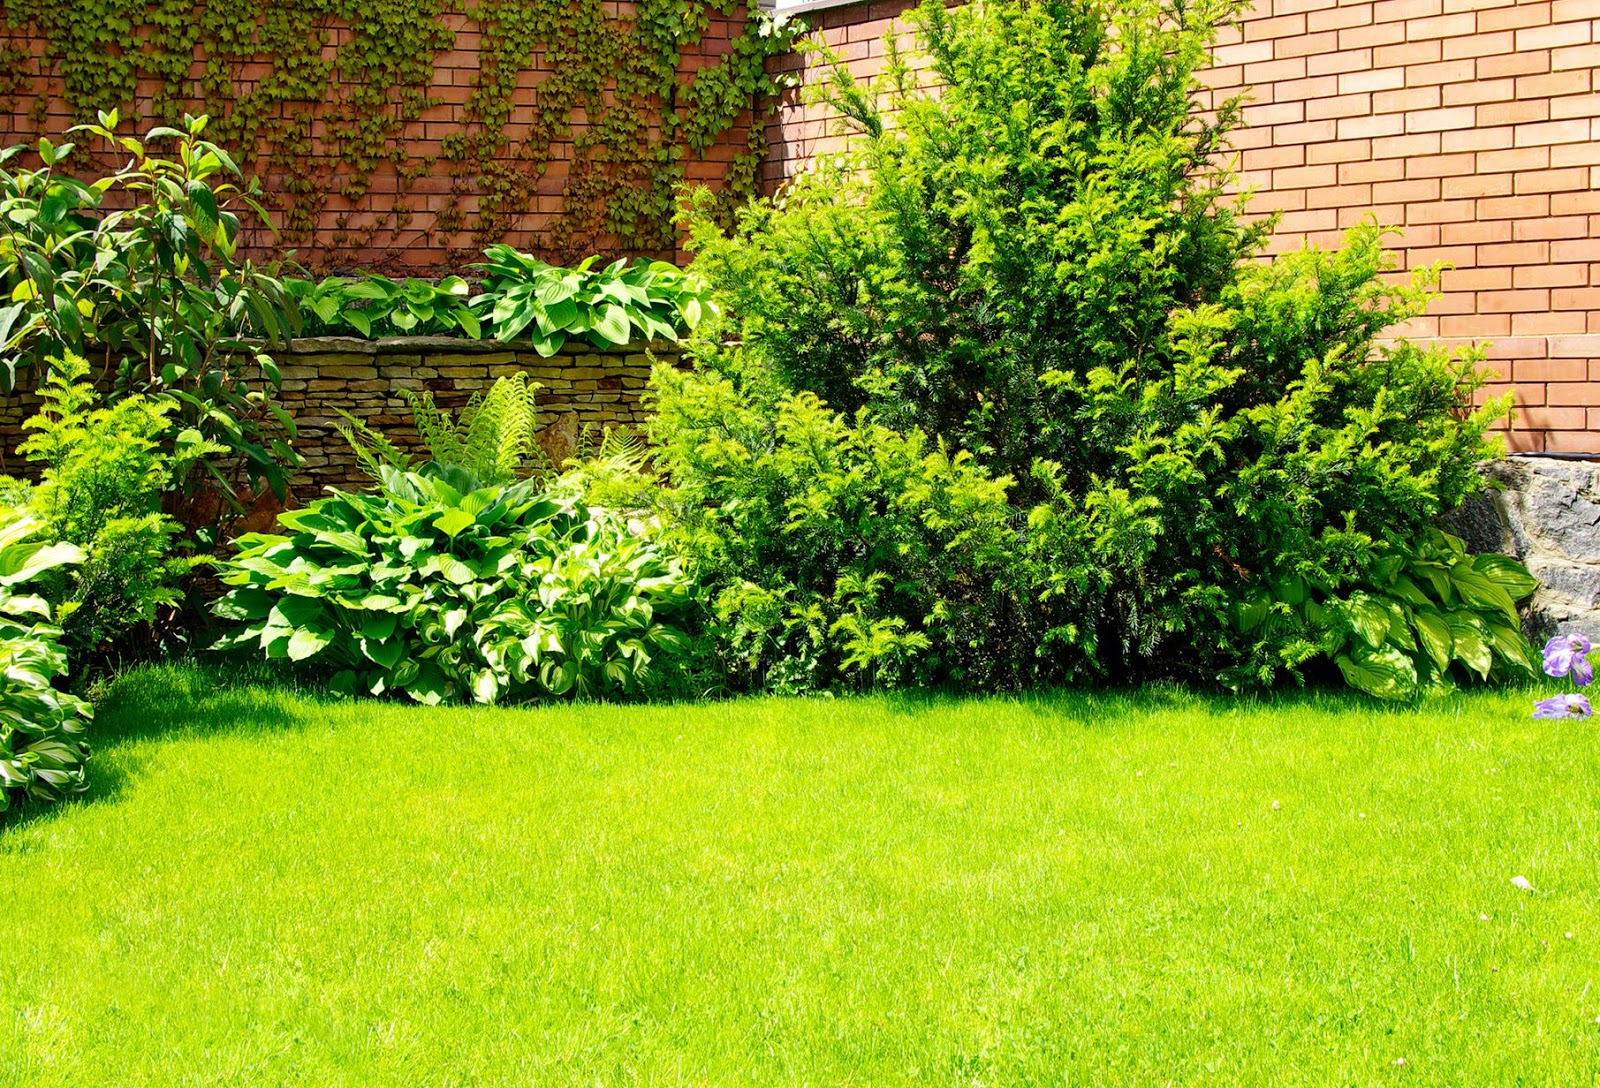 Im gene experience 9 fotos de jardines dise o exterior - Fotos de jardines ...